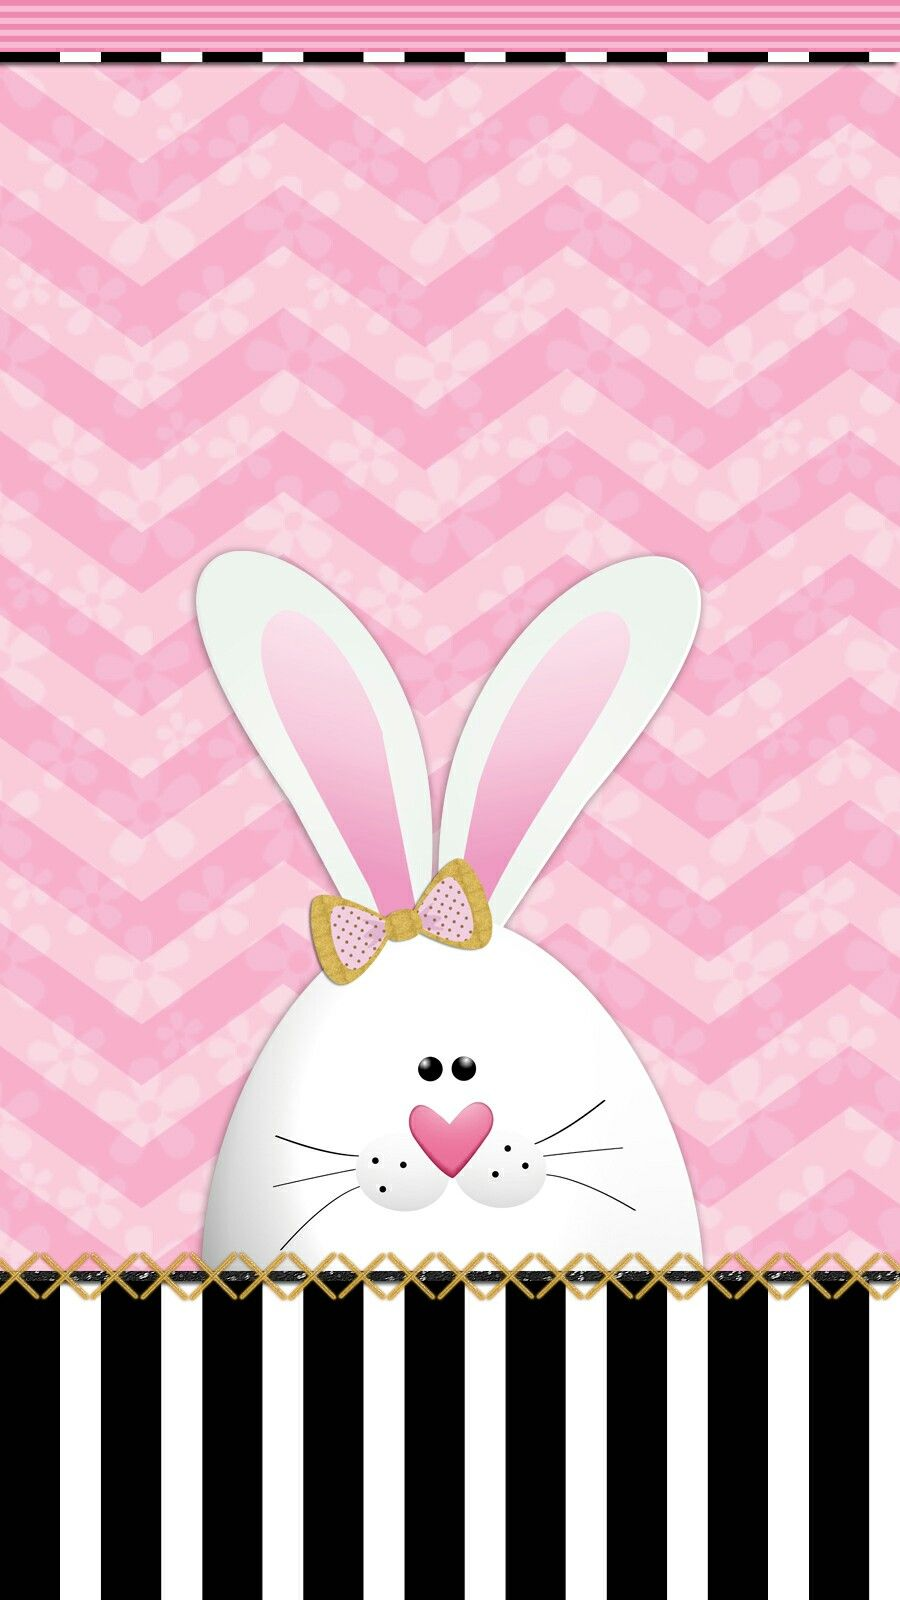 Easter Bunny Wallpaper Iphone Easter Wallpaper Spring Wallpaper Cute Home Screen Wallpaper